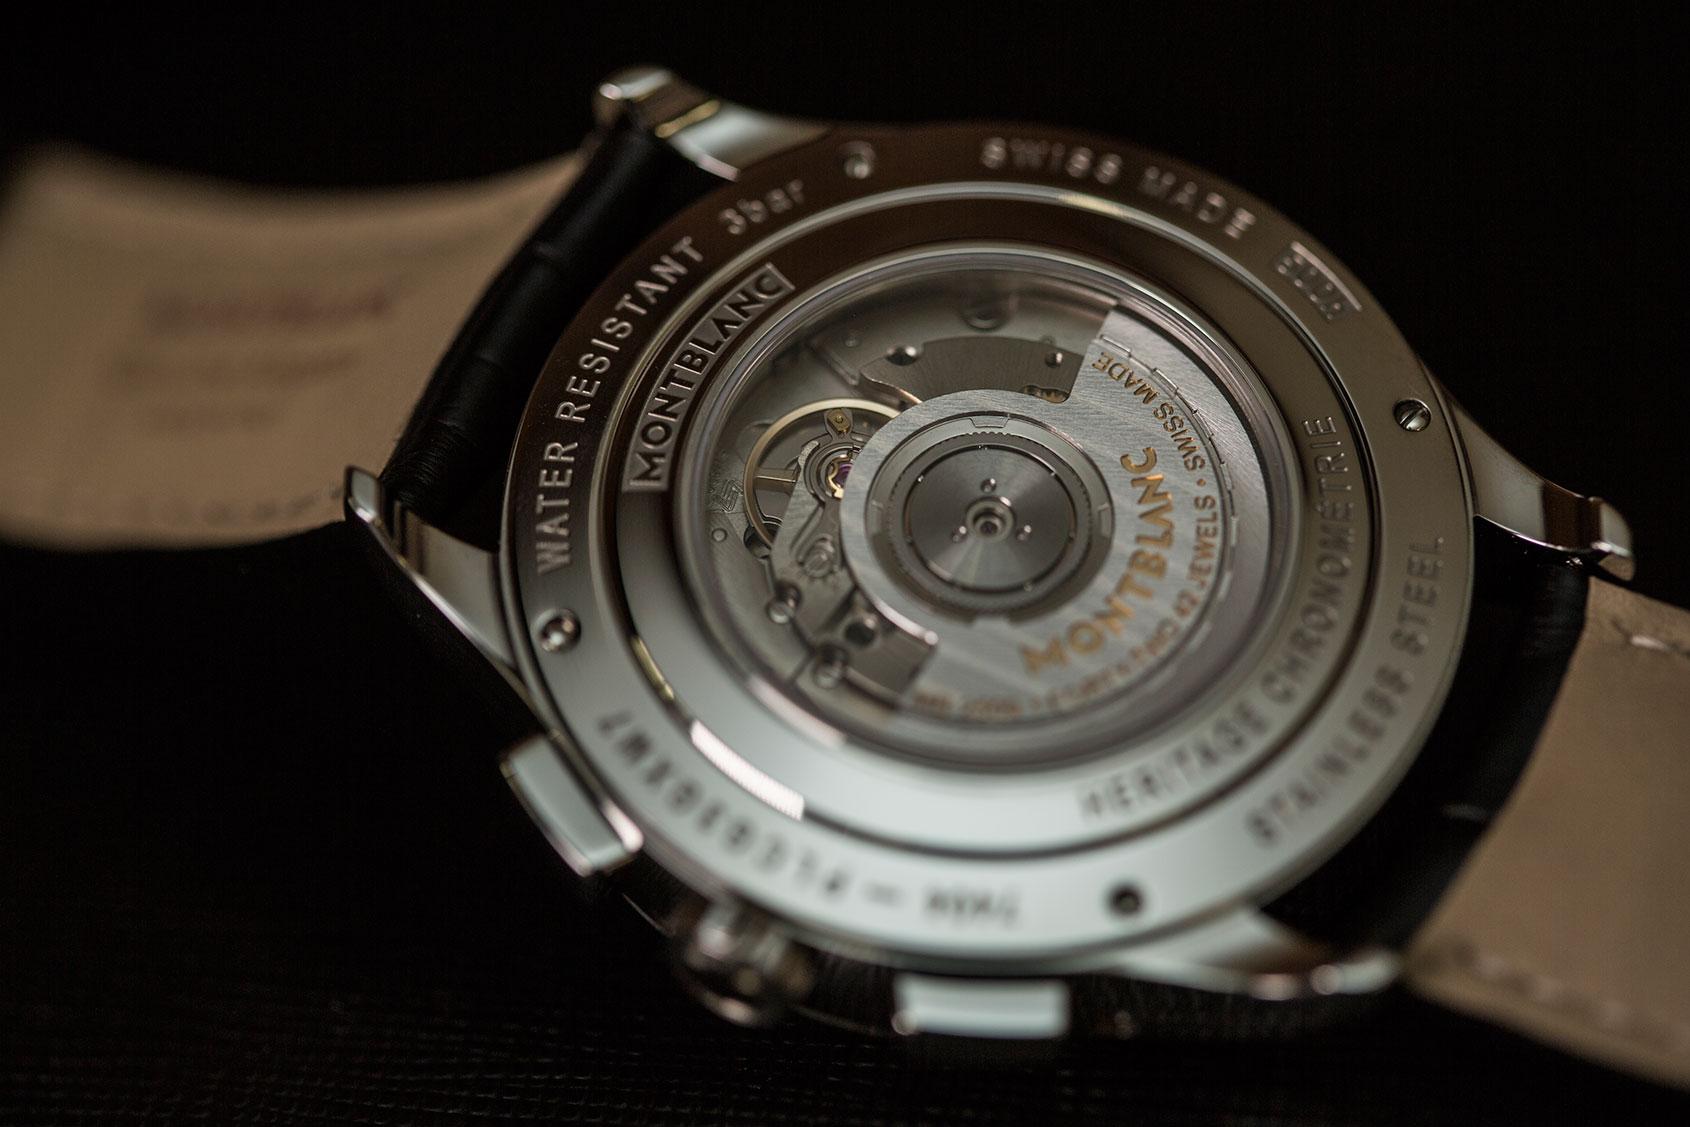 montblanc-heritage-chronometrie-annual-calendar-chronograph-4